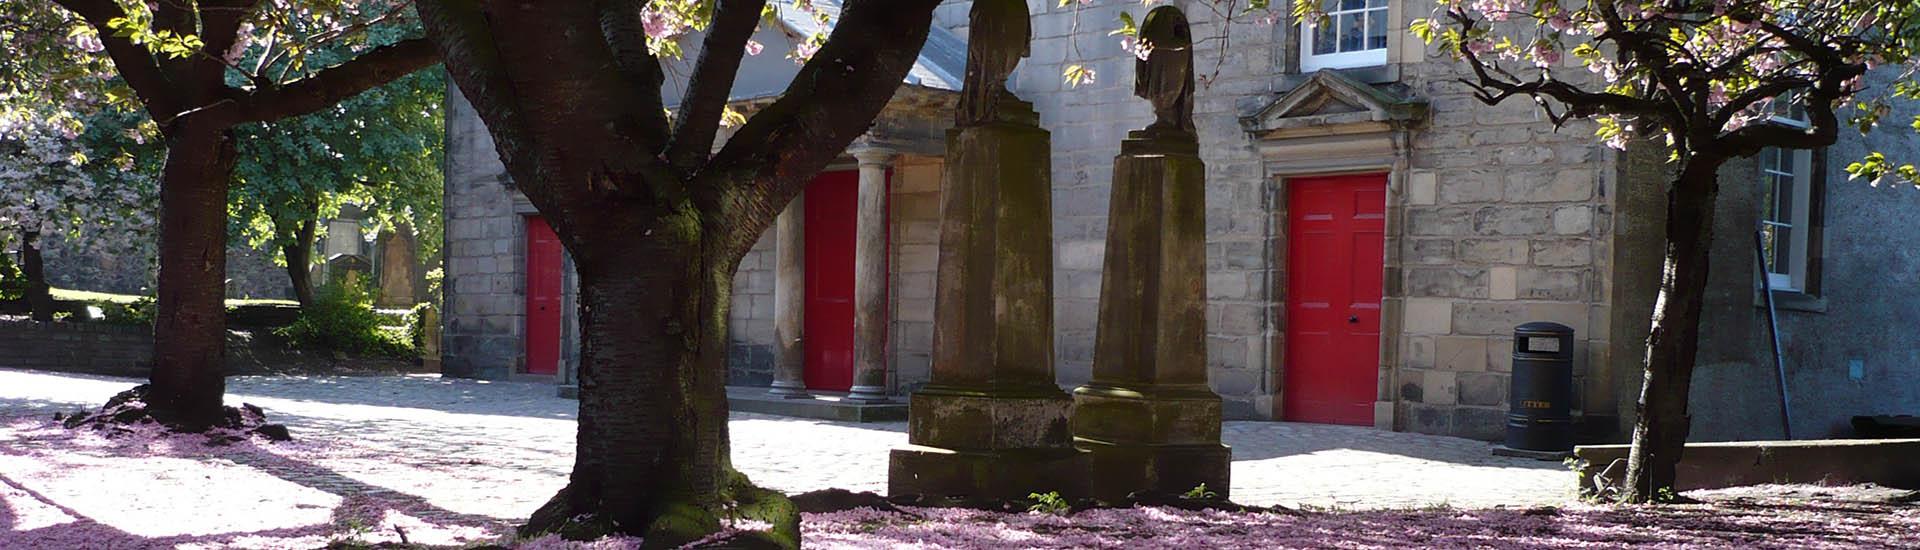 Canongate Kirkyard - Christian Heritage Centre